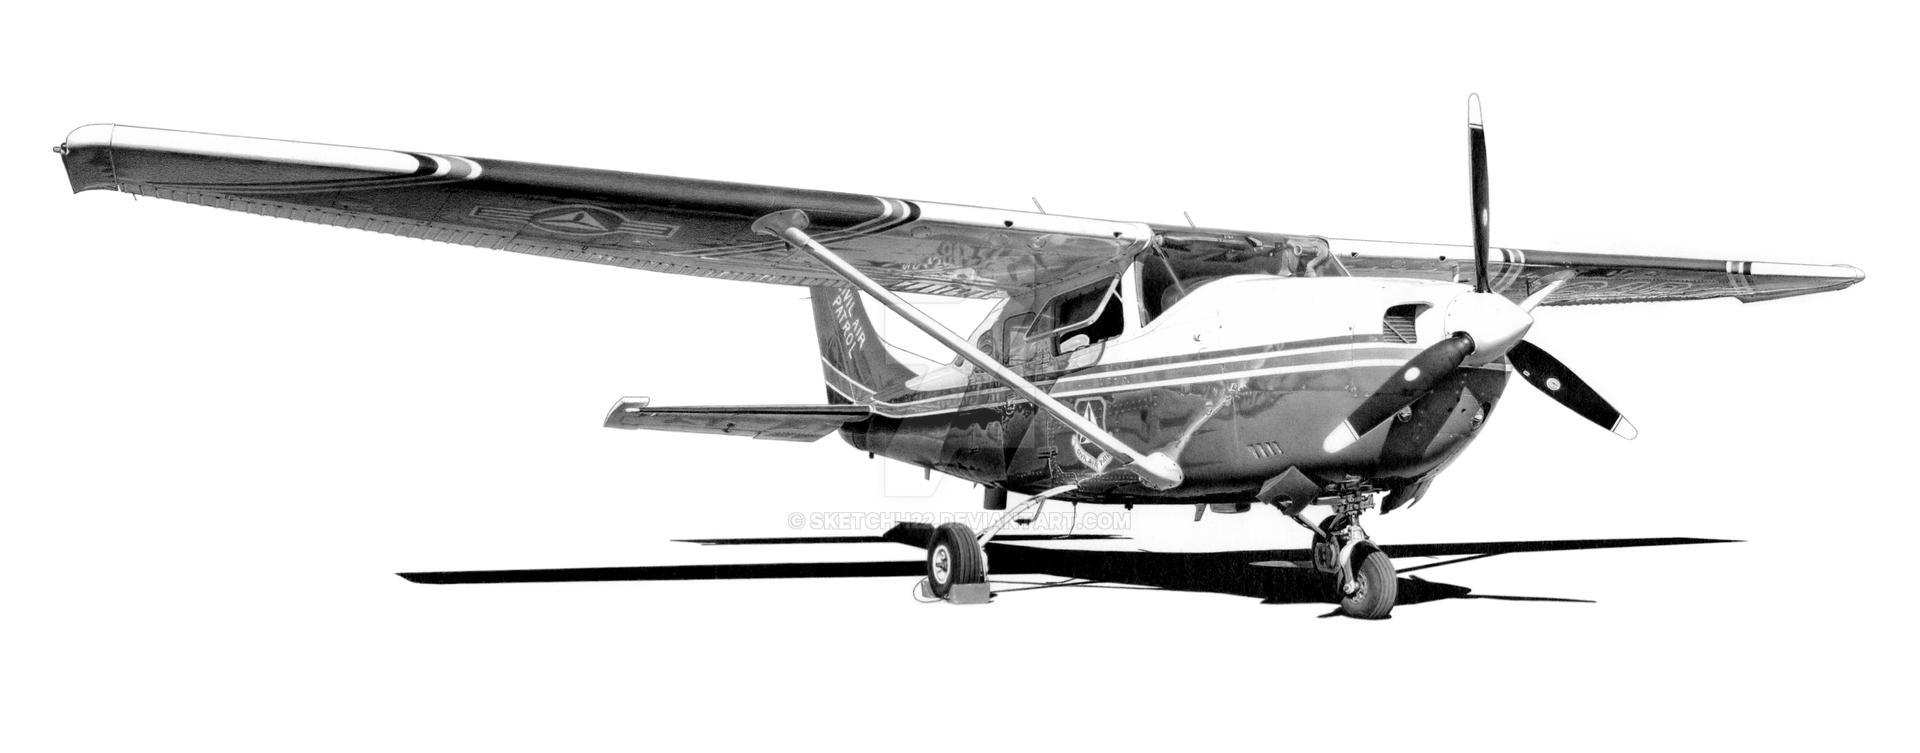 civil_air_patrol_cessna_206_print_ver_by